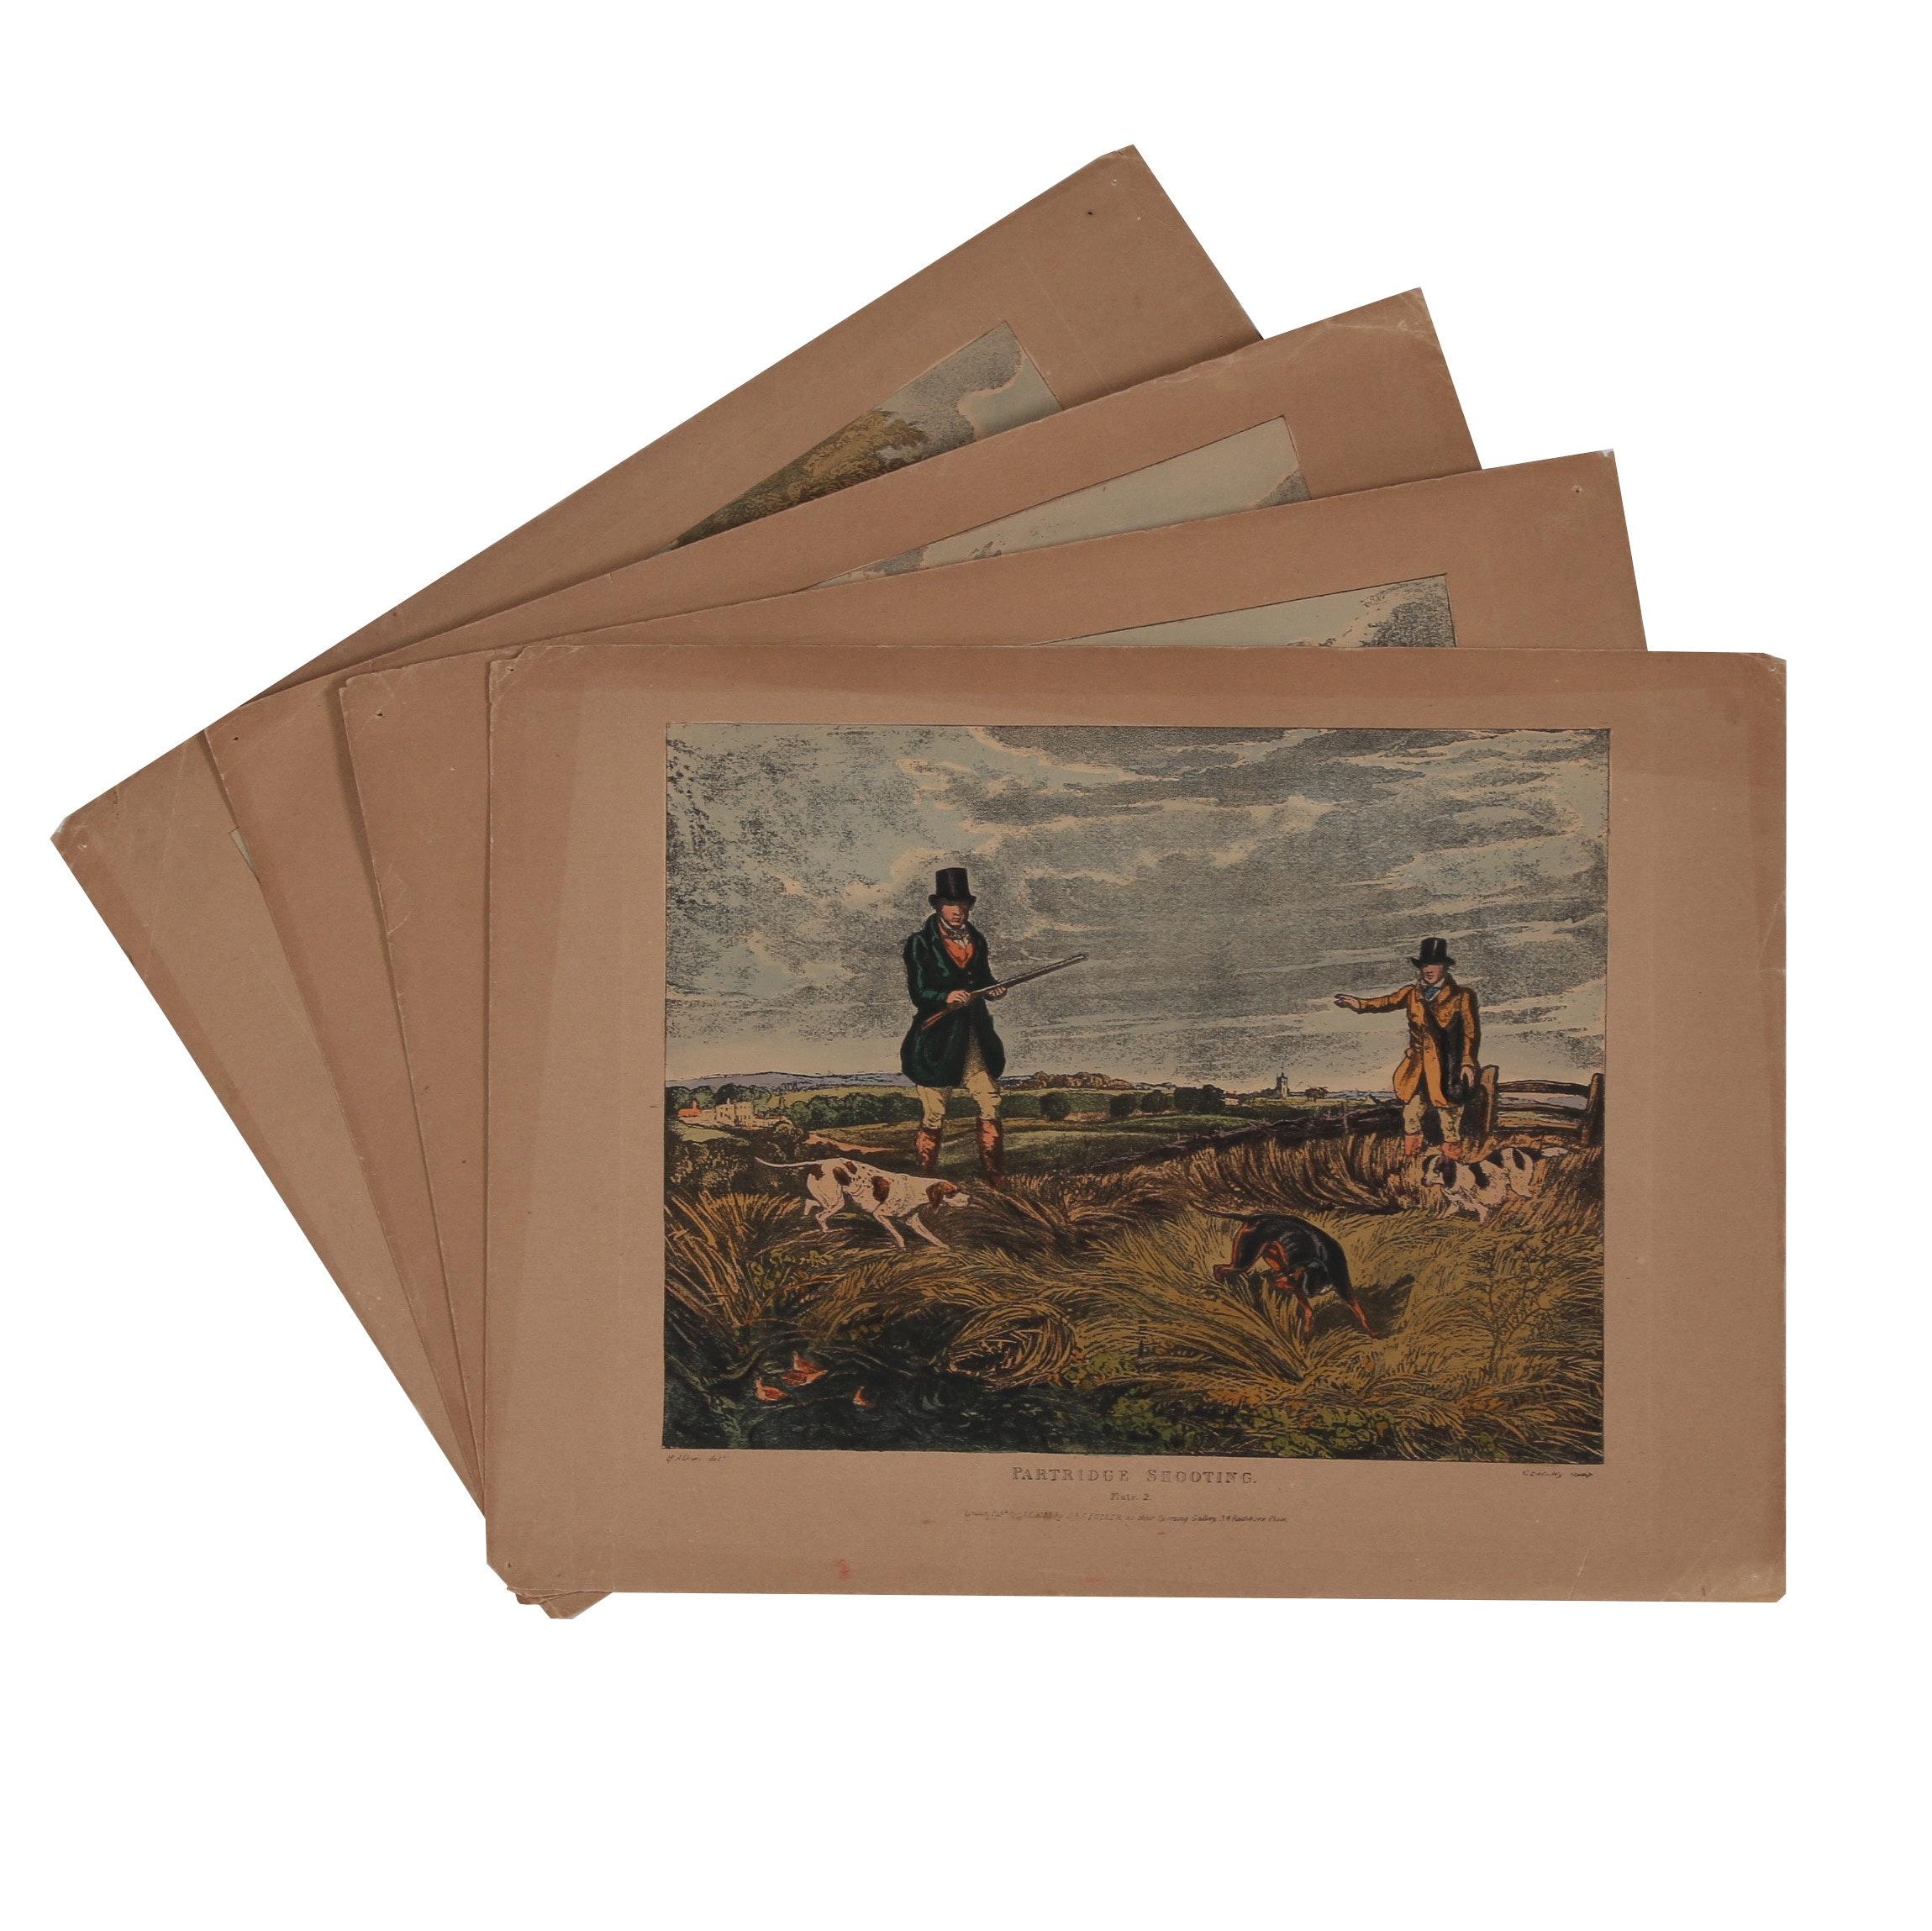 "Hand-Colored Wood Engravings after Charles Bentley ""Partridge Shooting"""